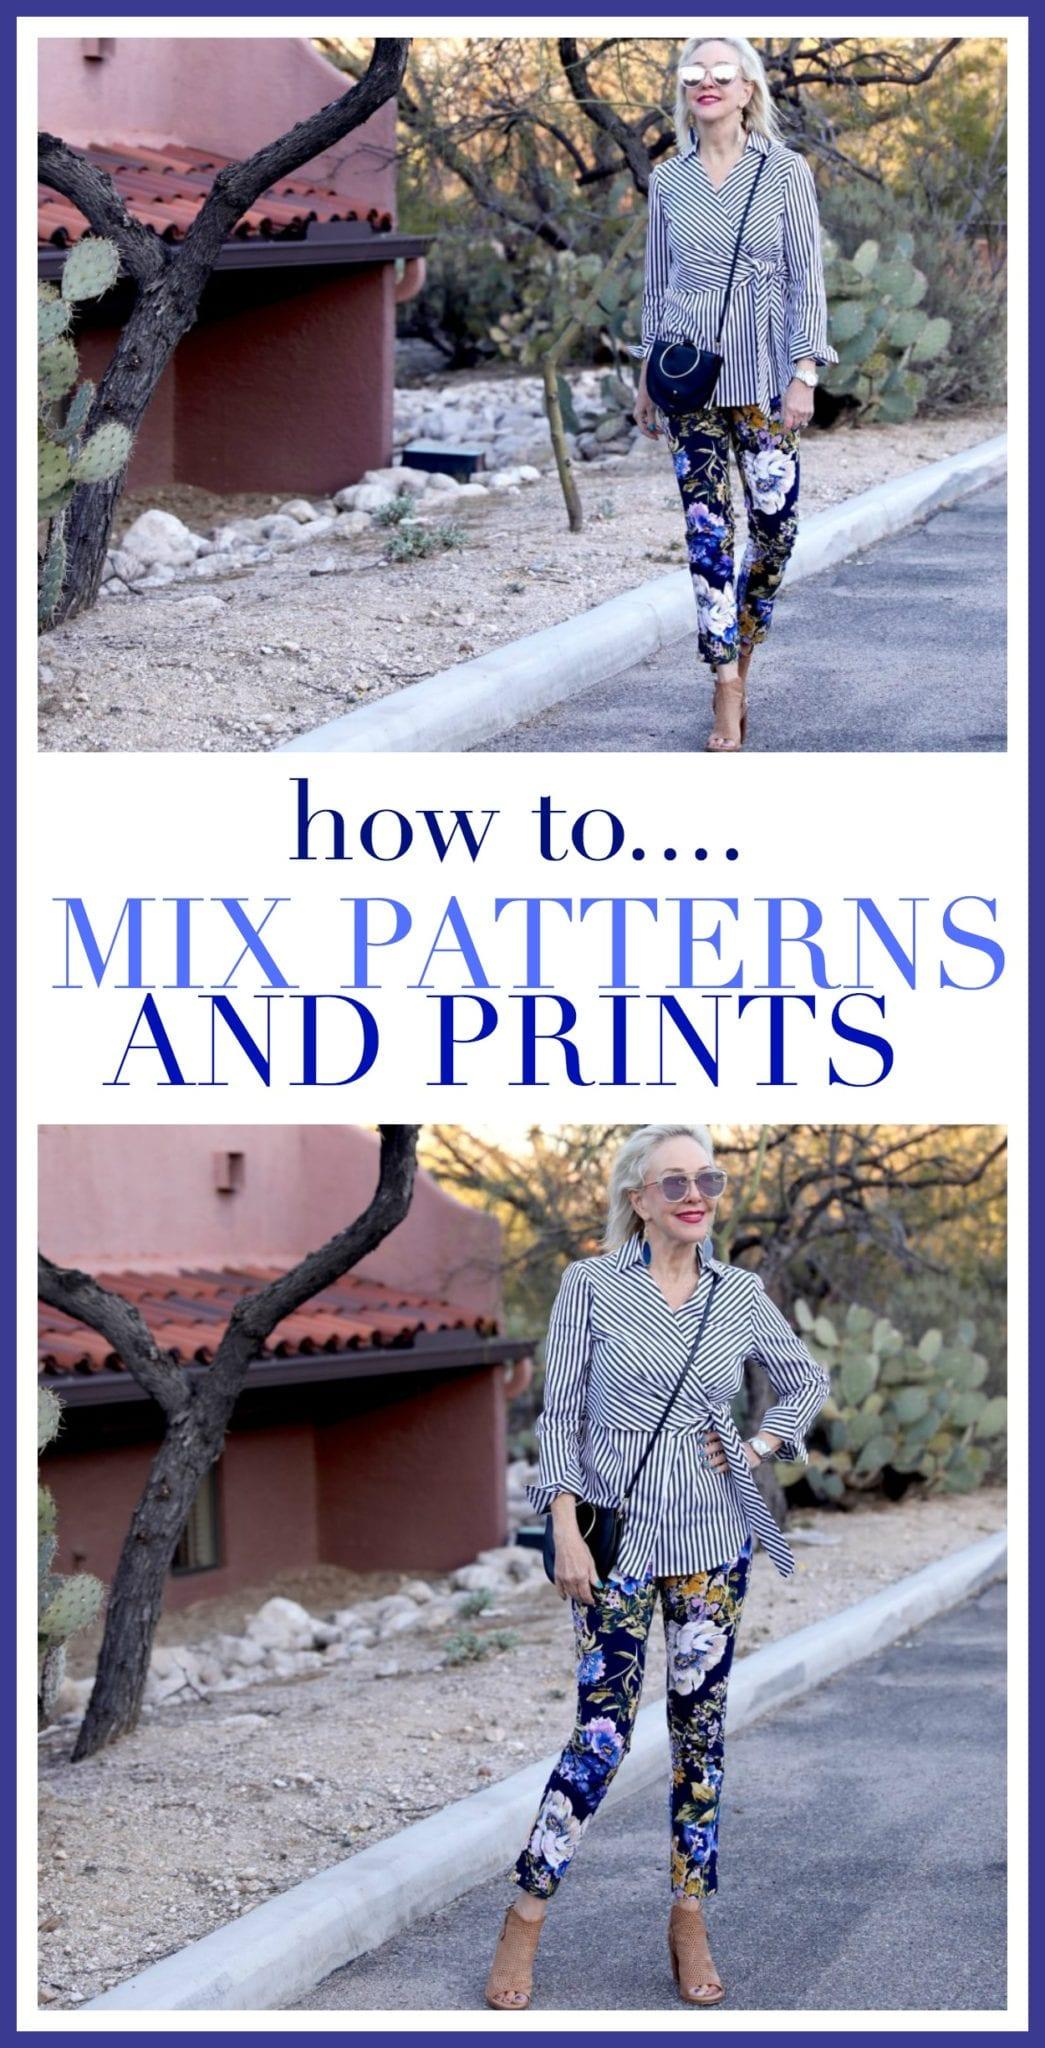 mixing prints, spring style, spring prints, fashion tips, spring fashion, how to mix prints, how to mix patterns